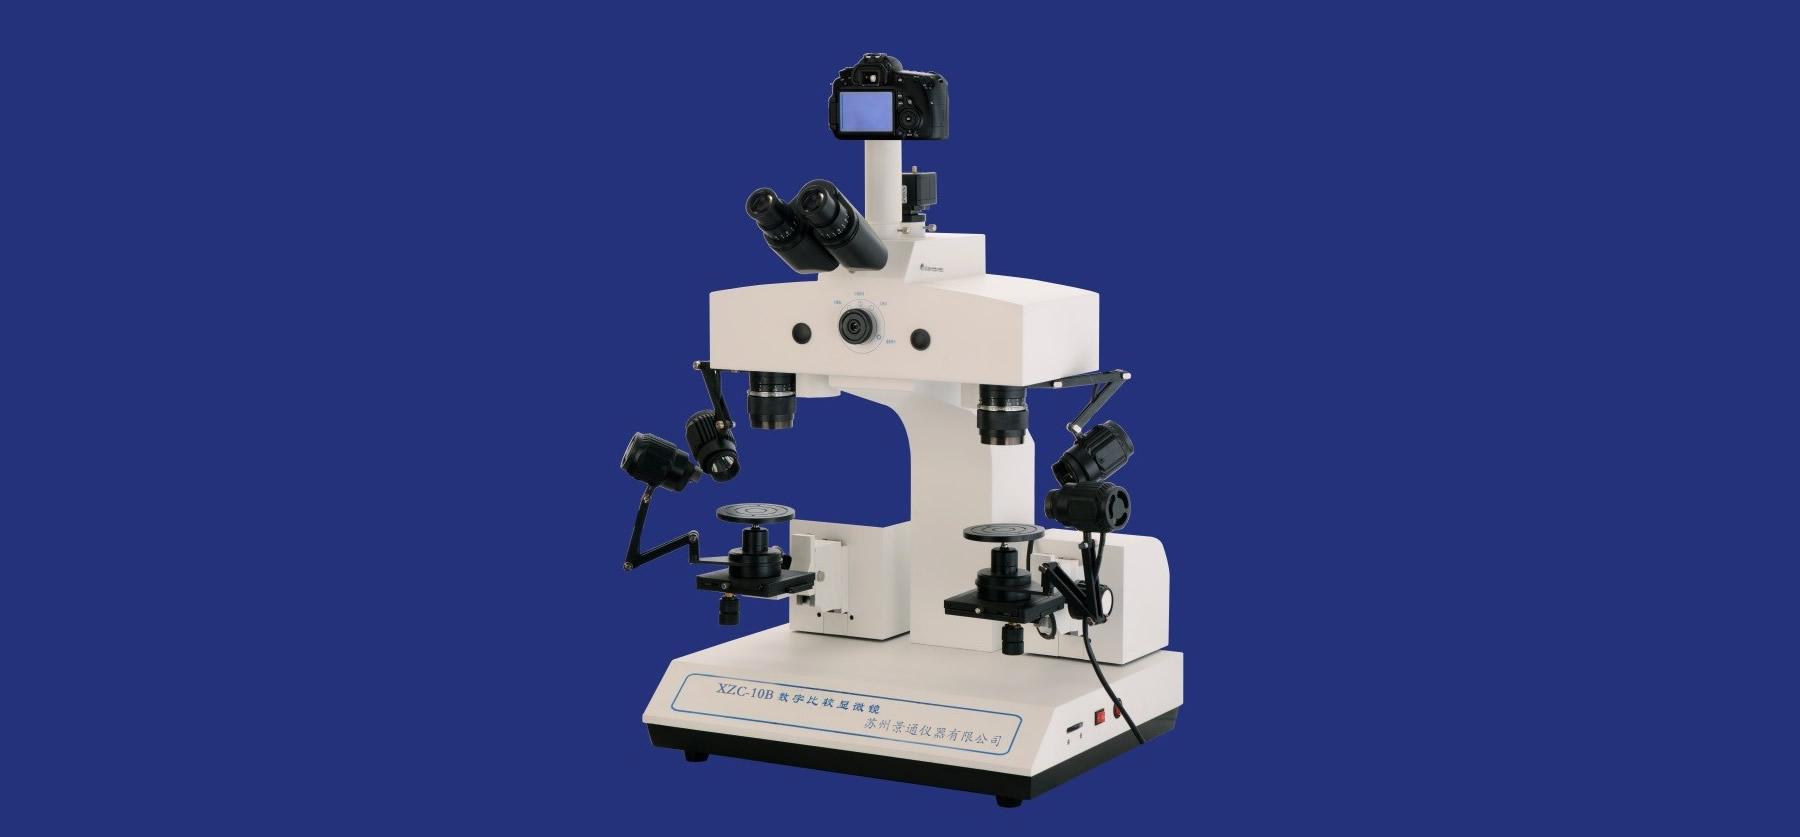 XZC-10B数码比较显微镜